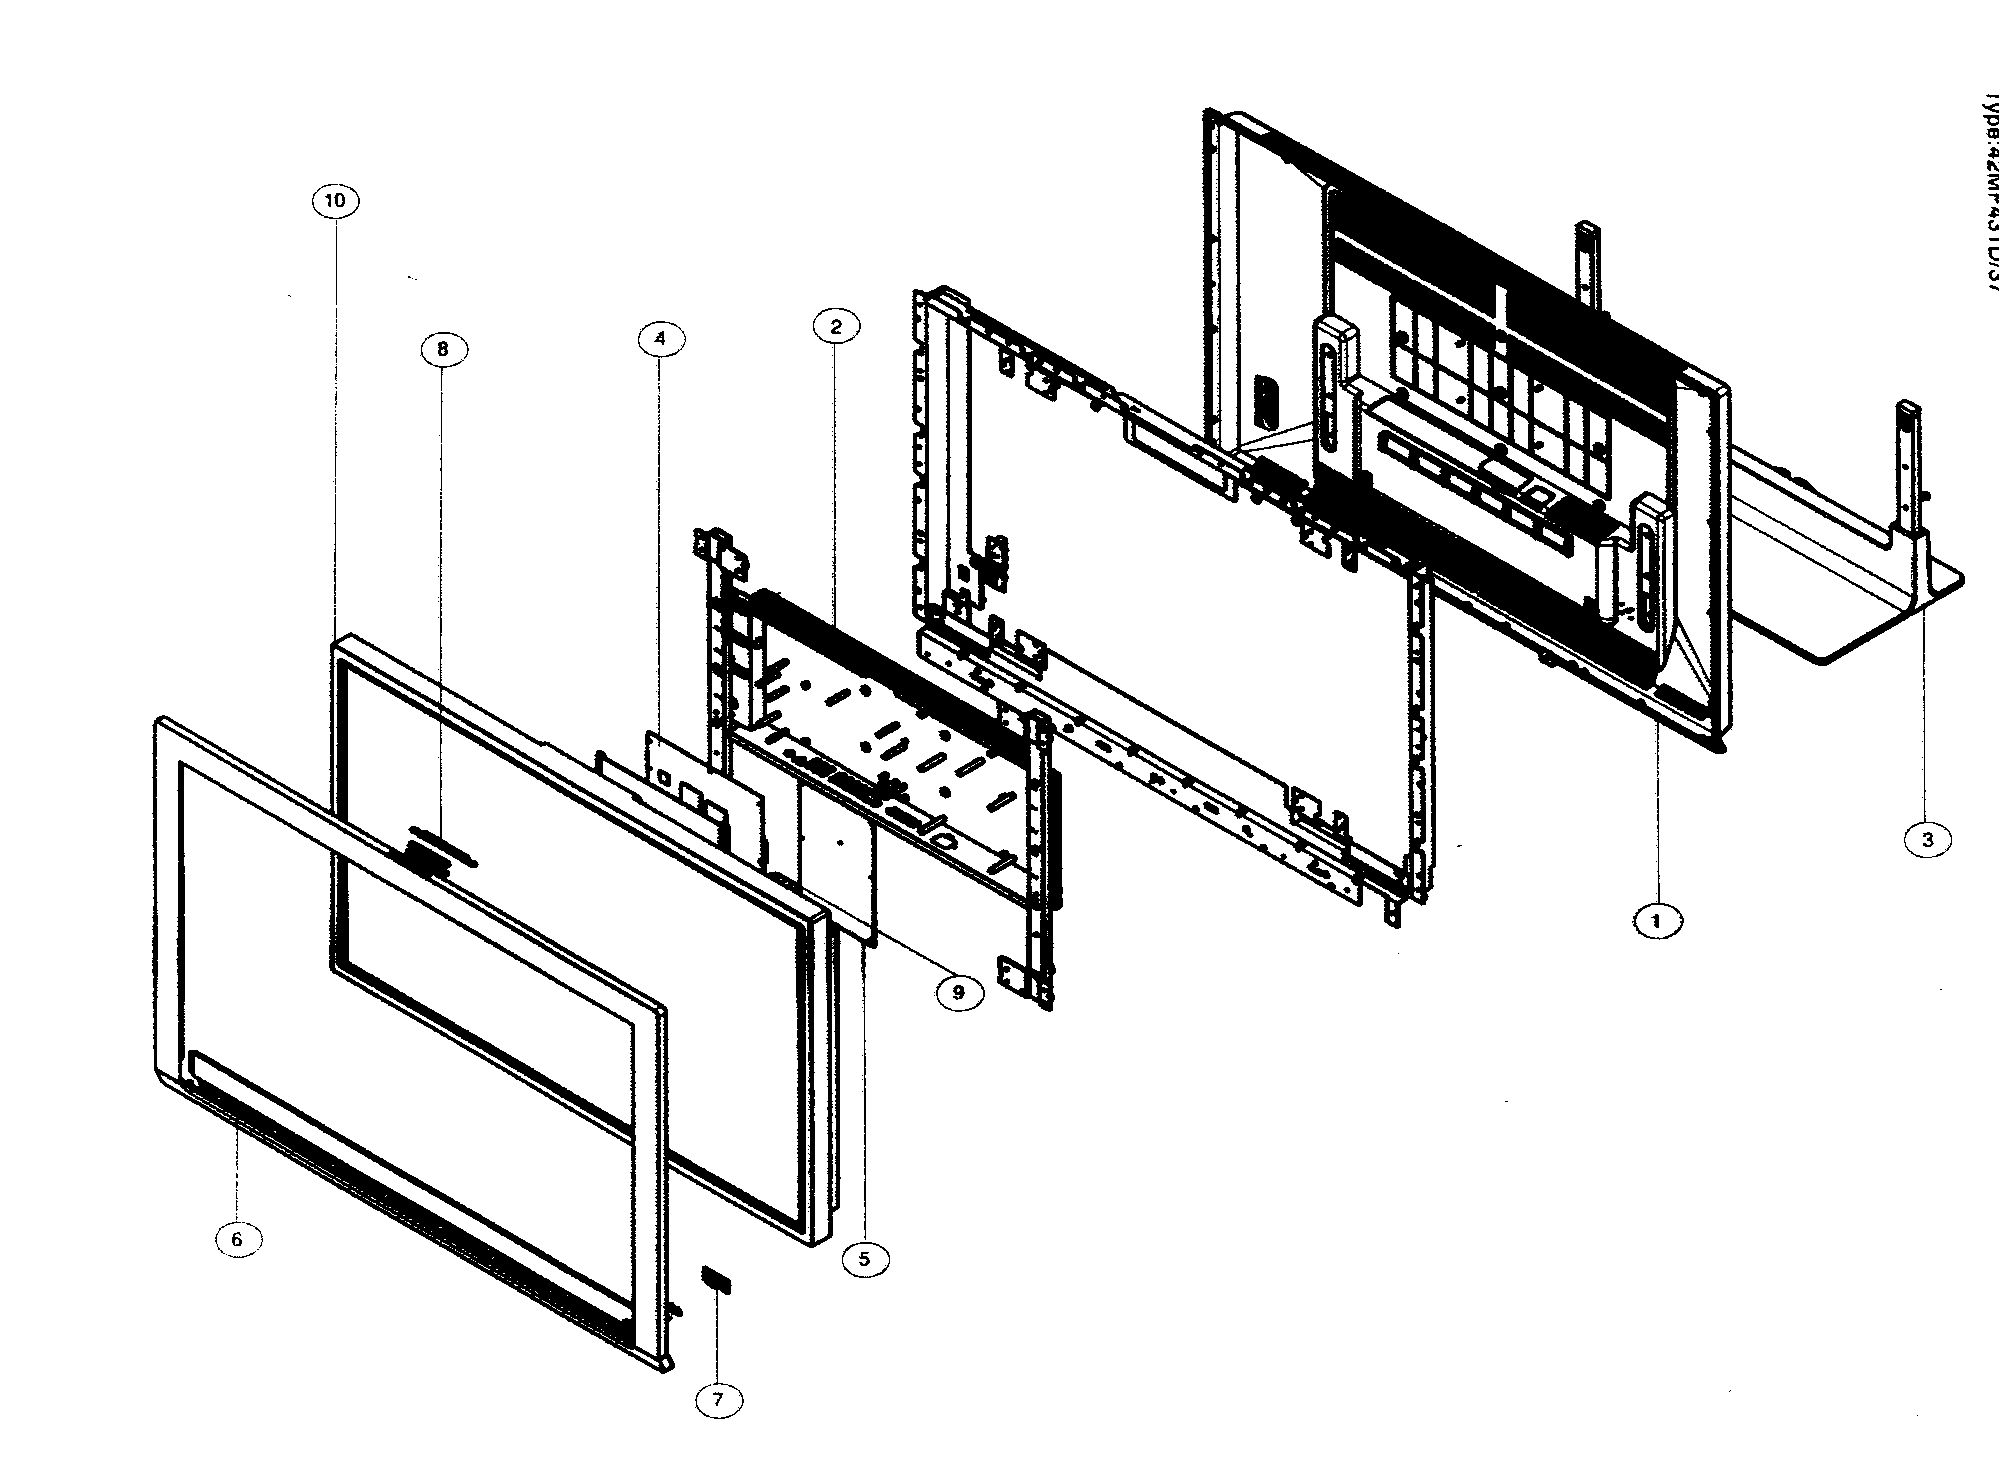 Magnavox Dvd Vcr Wiring Diagram Toshiba Dvd Vcr Wiring